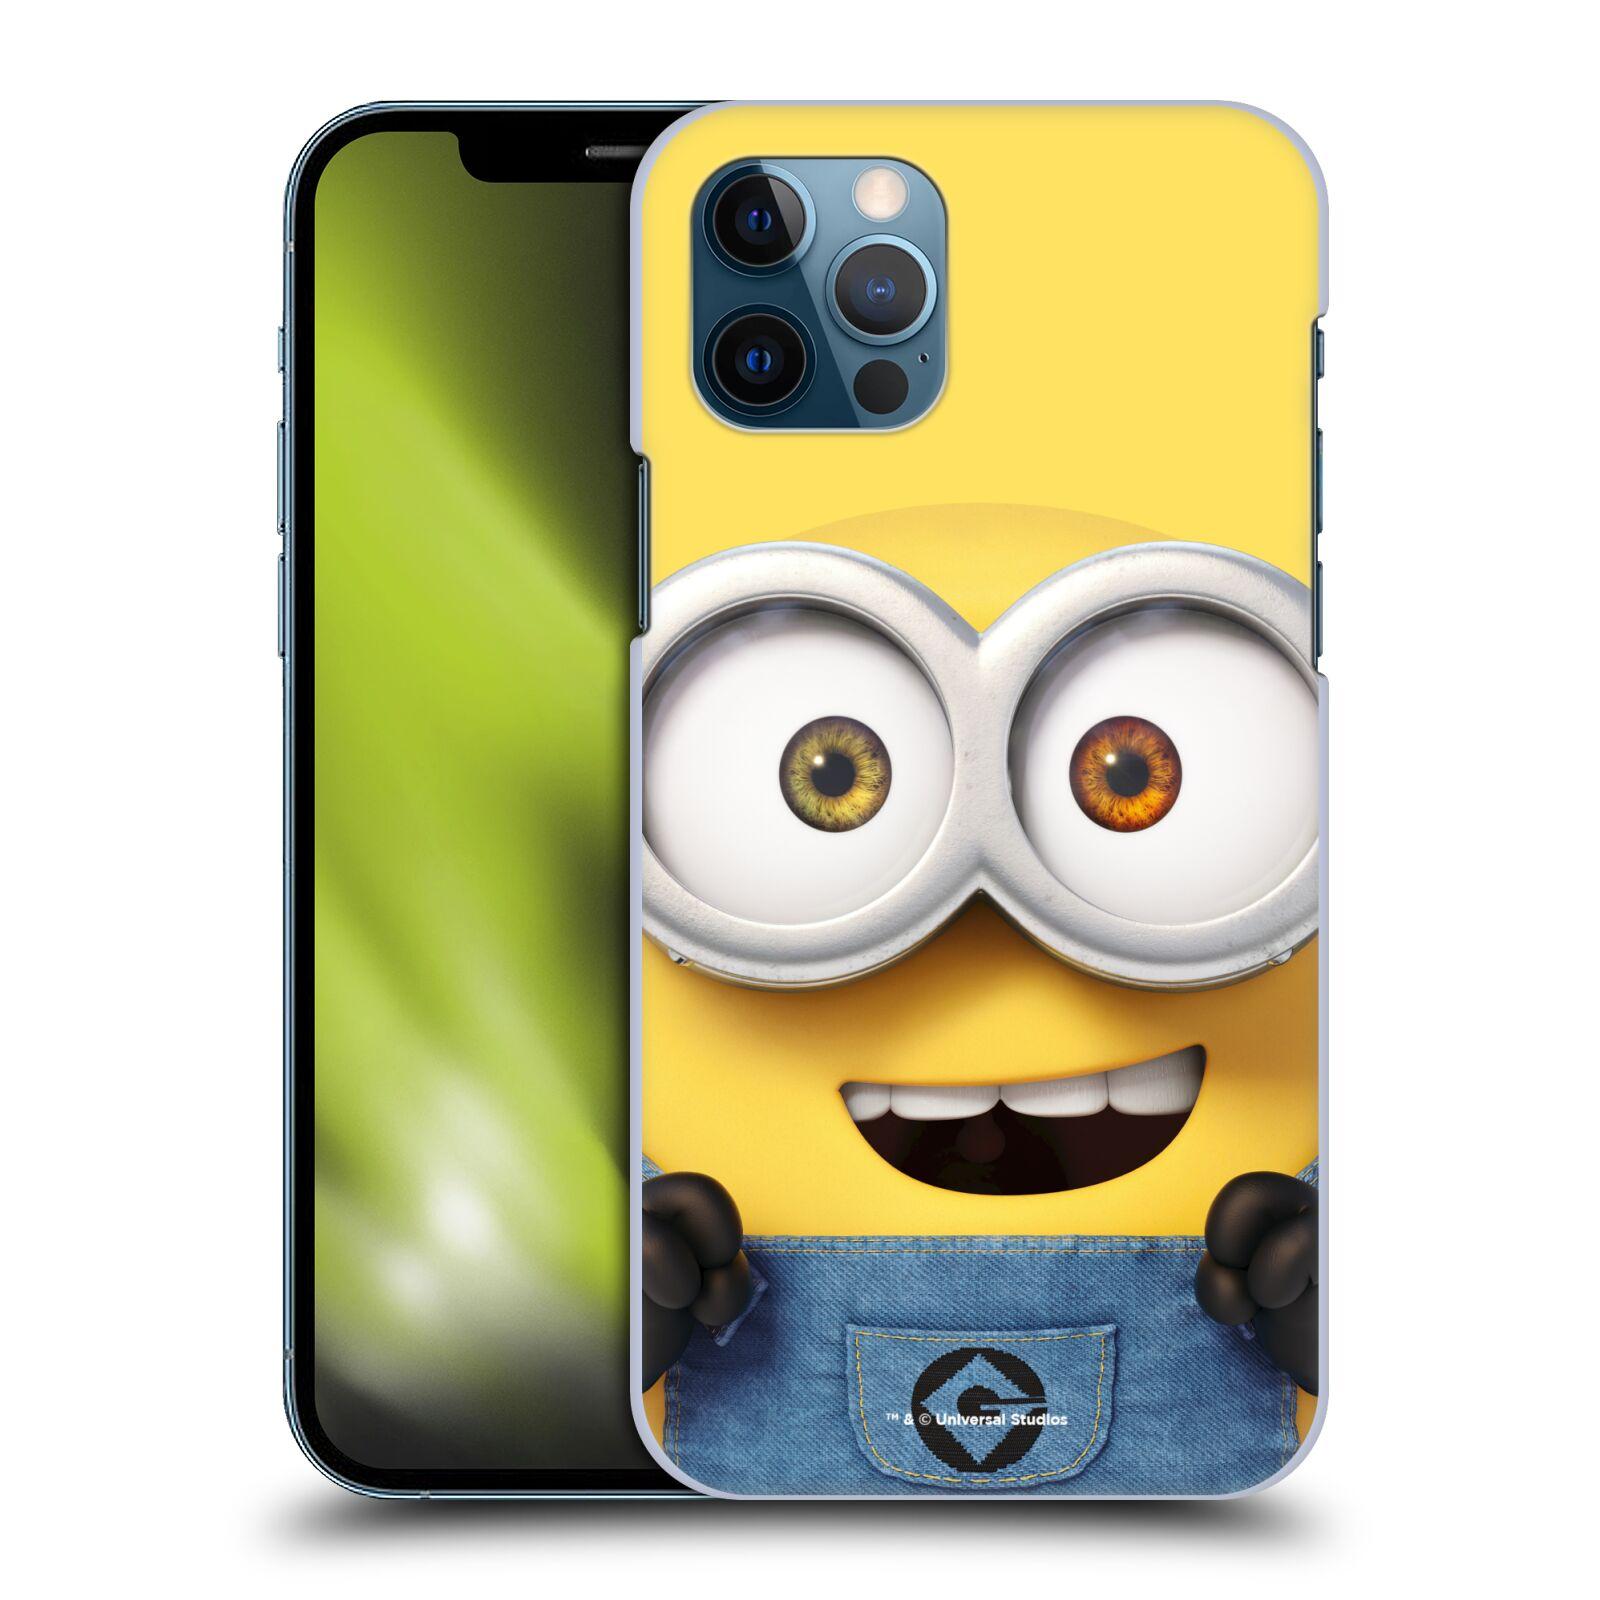 Plastové pouzdro na mobil Apple iPhone 12 / 12 Pro - Head Case - Mimoň Bob z filmu Já, padouch - Despicable Me